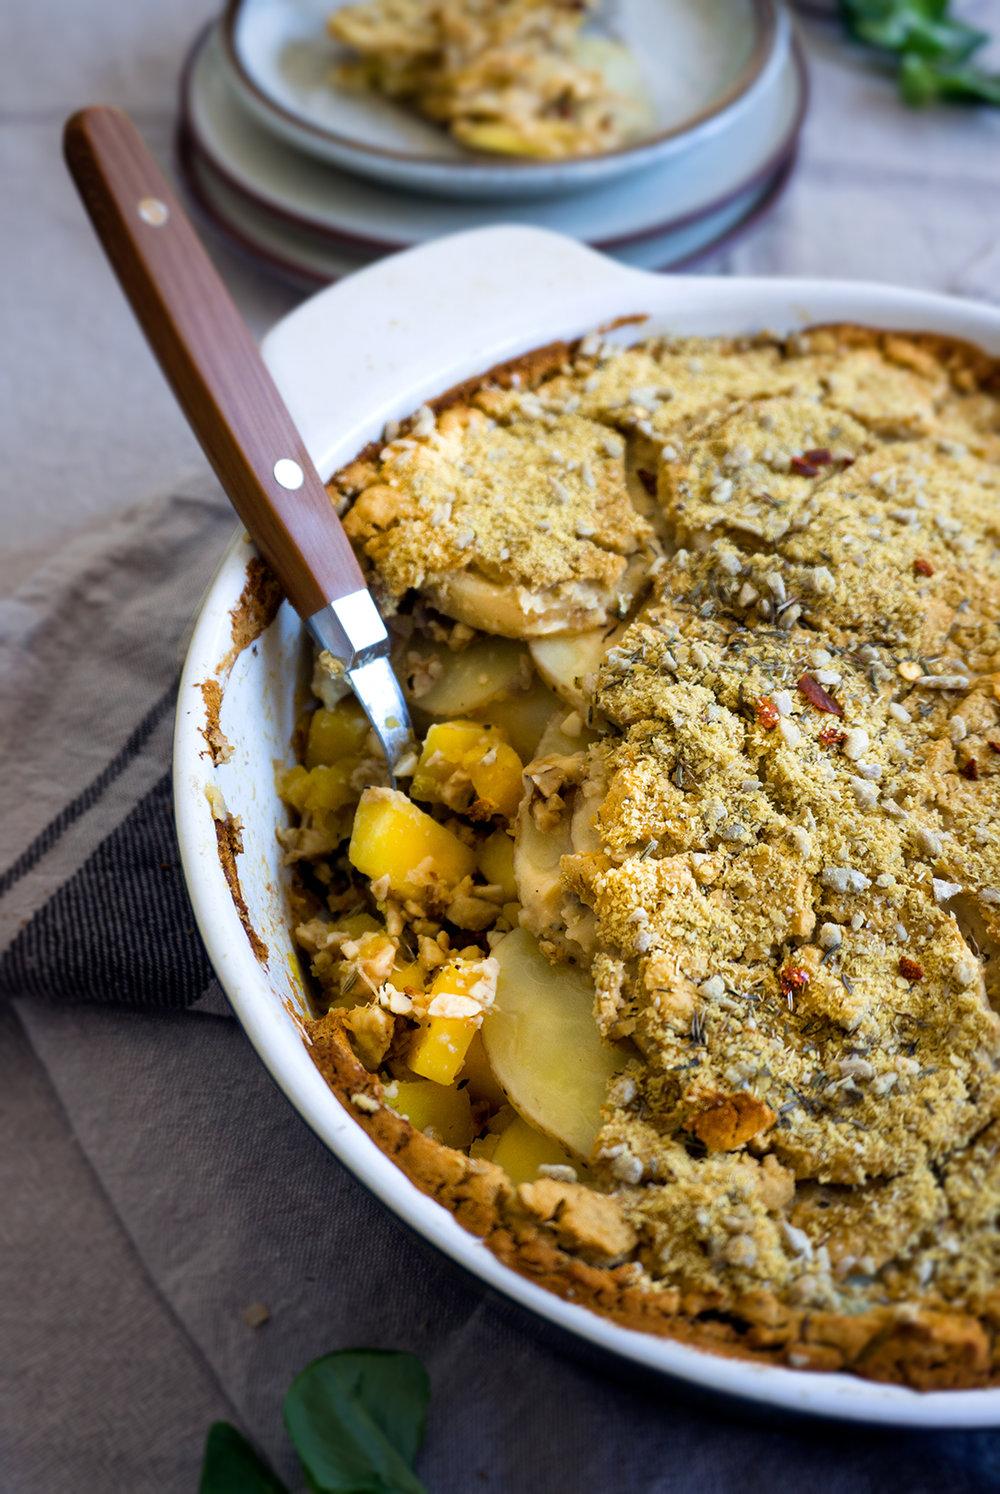 pompoen-aardappelgratin-vegan-whole-foods-olievrij-glutenvrij.jpg